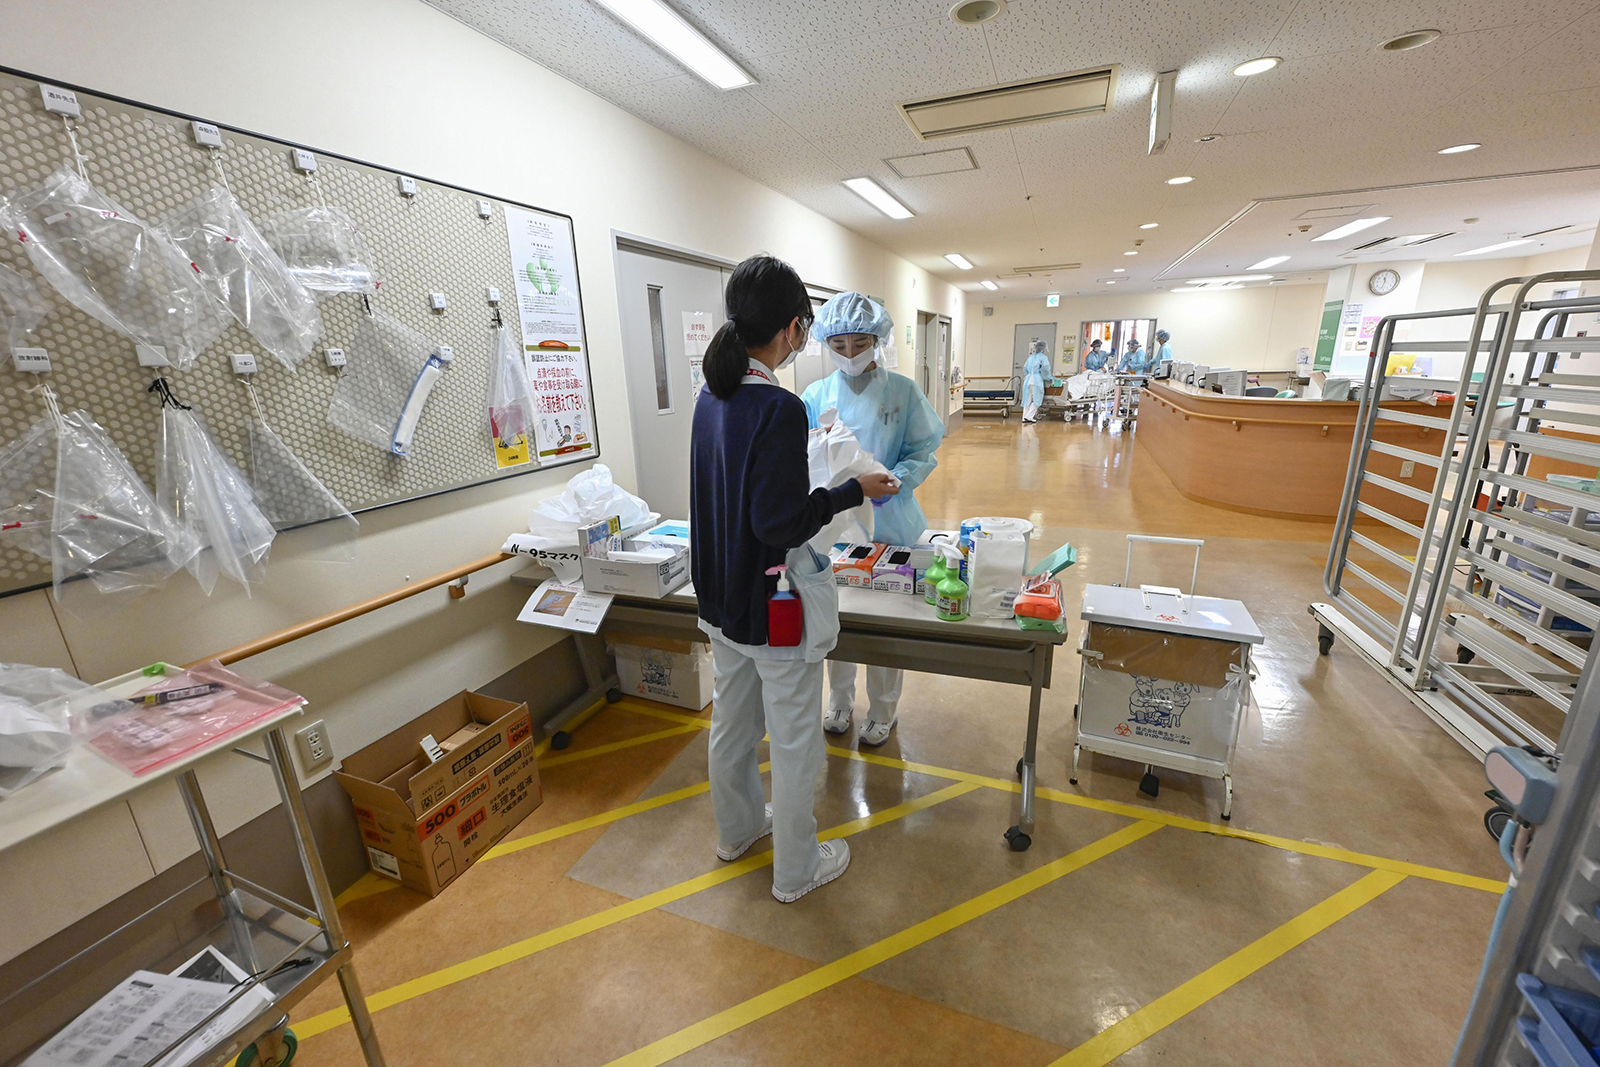 Nurses work in a ward earmarked for coronavirus patients at Kano General Hospital in Osaka, Japan, on February 4.